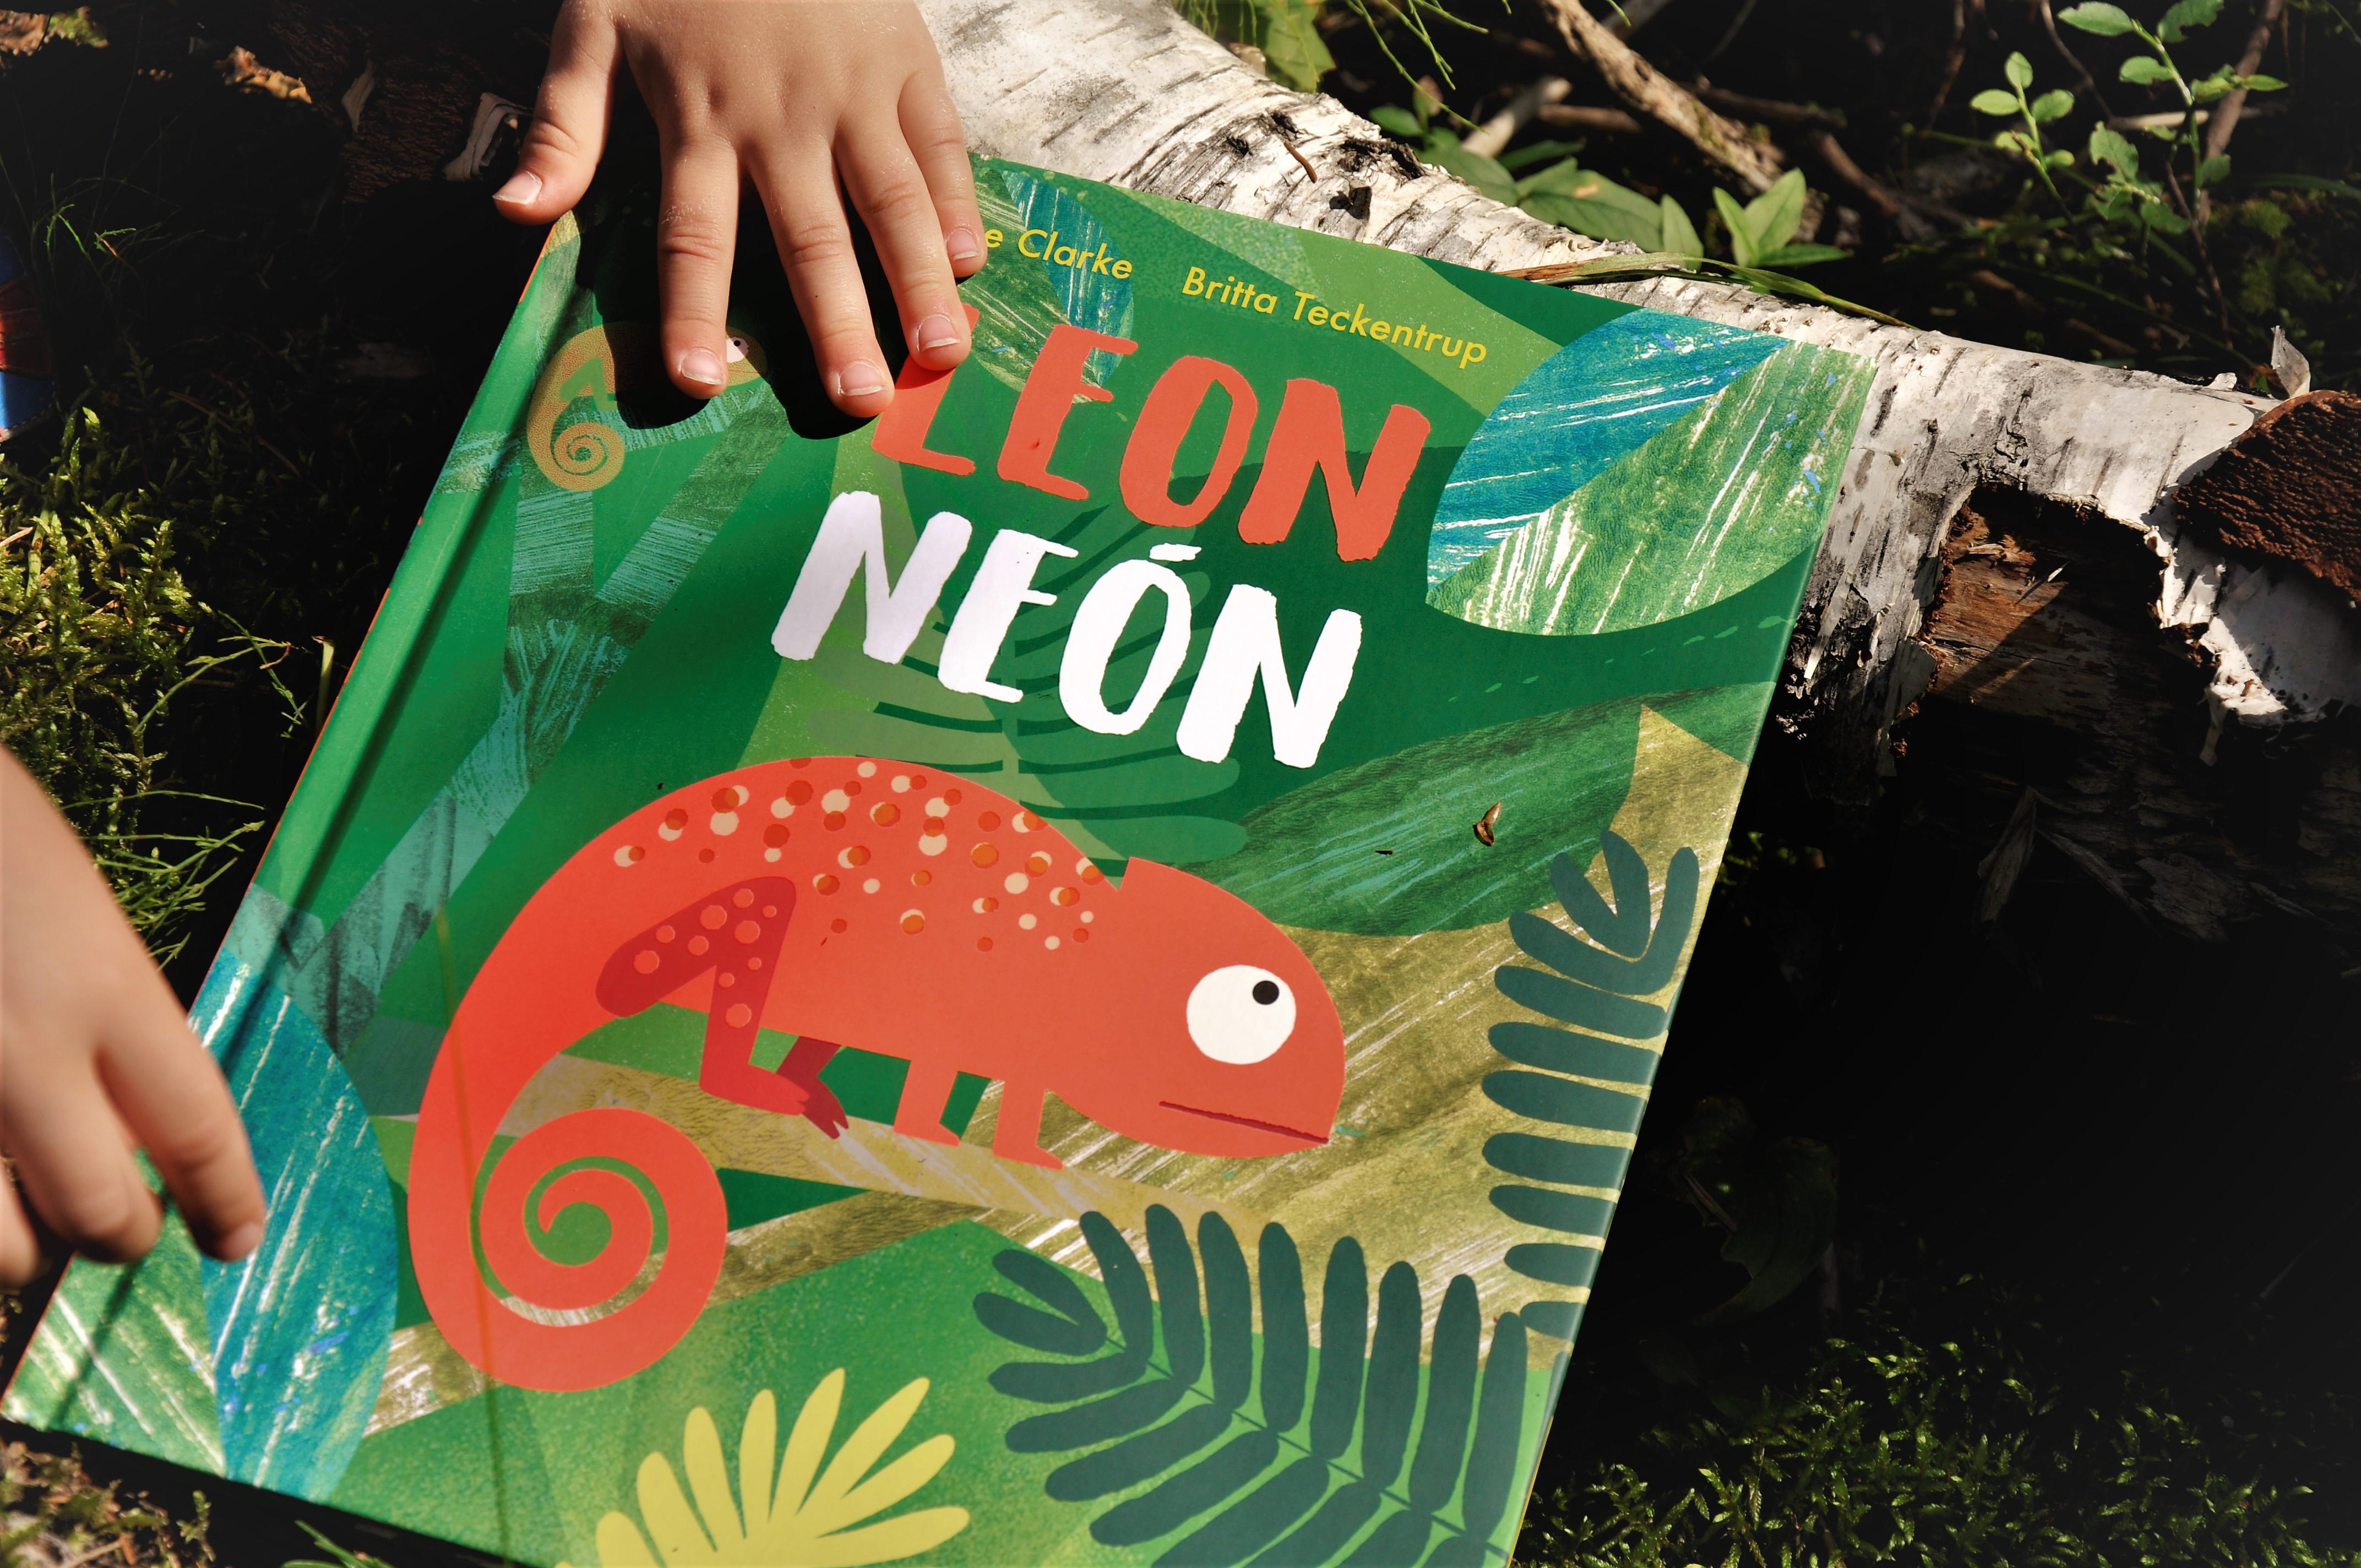 Leon Neón odetskychknihach.sk